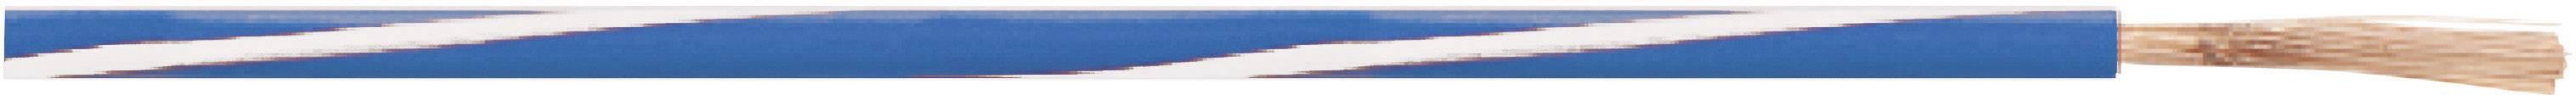 Opletenie / lanko LappKabel 4512453S X05V-K, 1 x 1 mm², vonkajší Ø 2.60 mm, metrový tovar, biela, hnedá